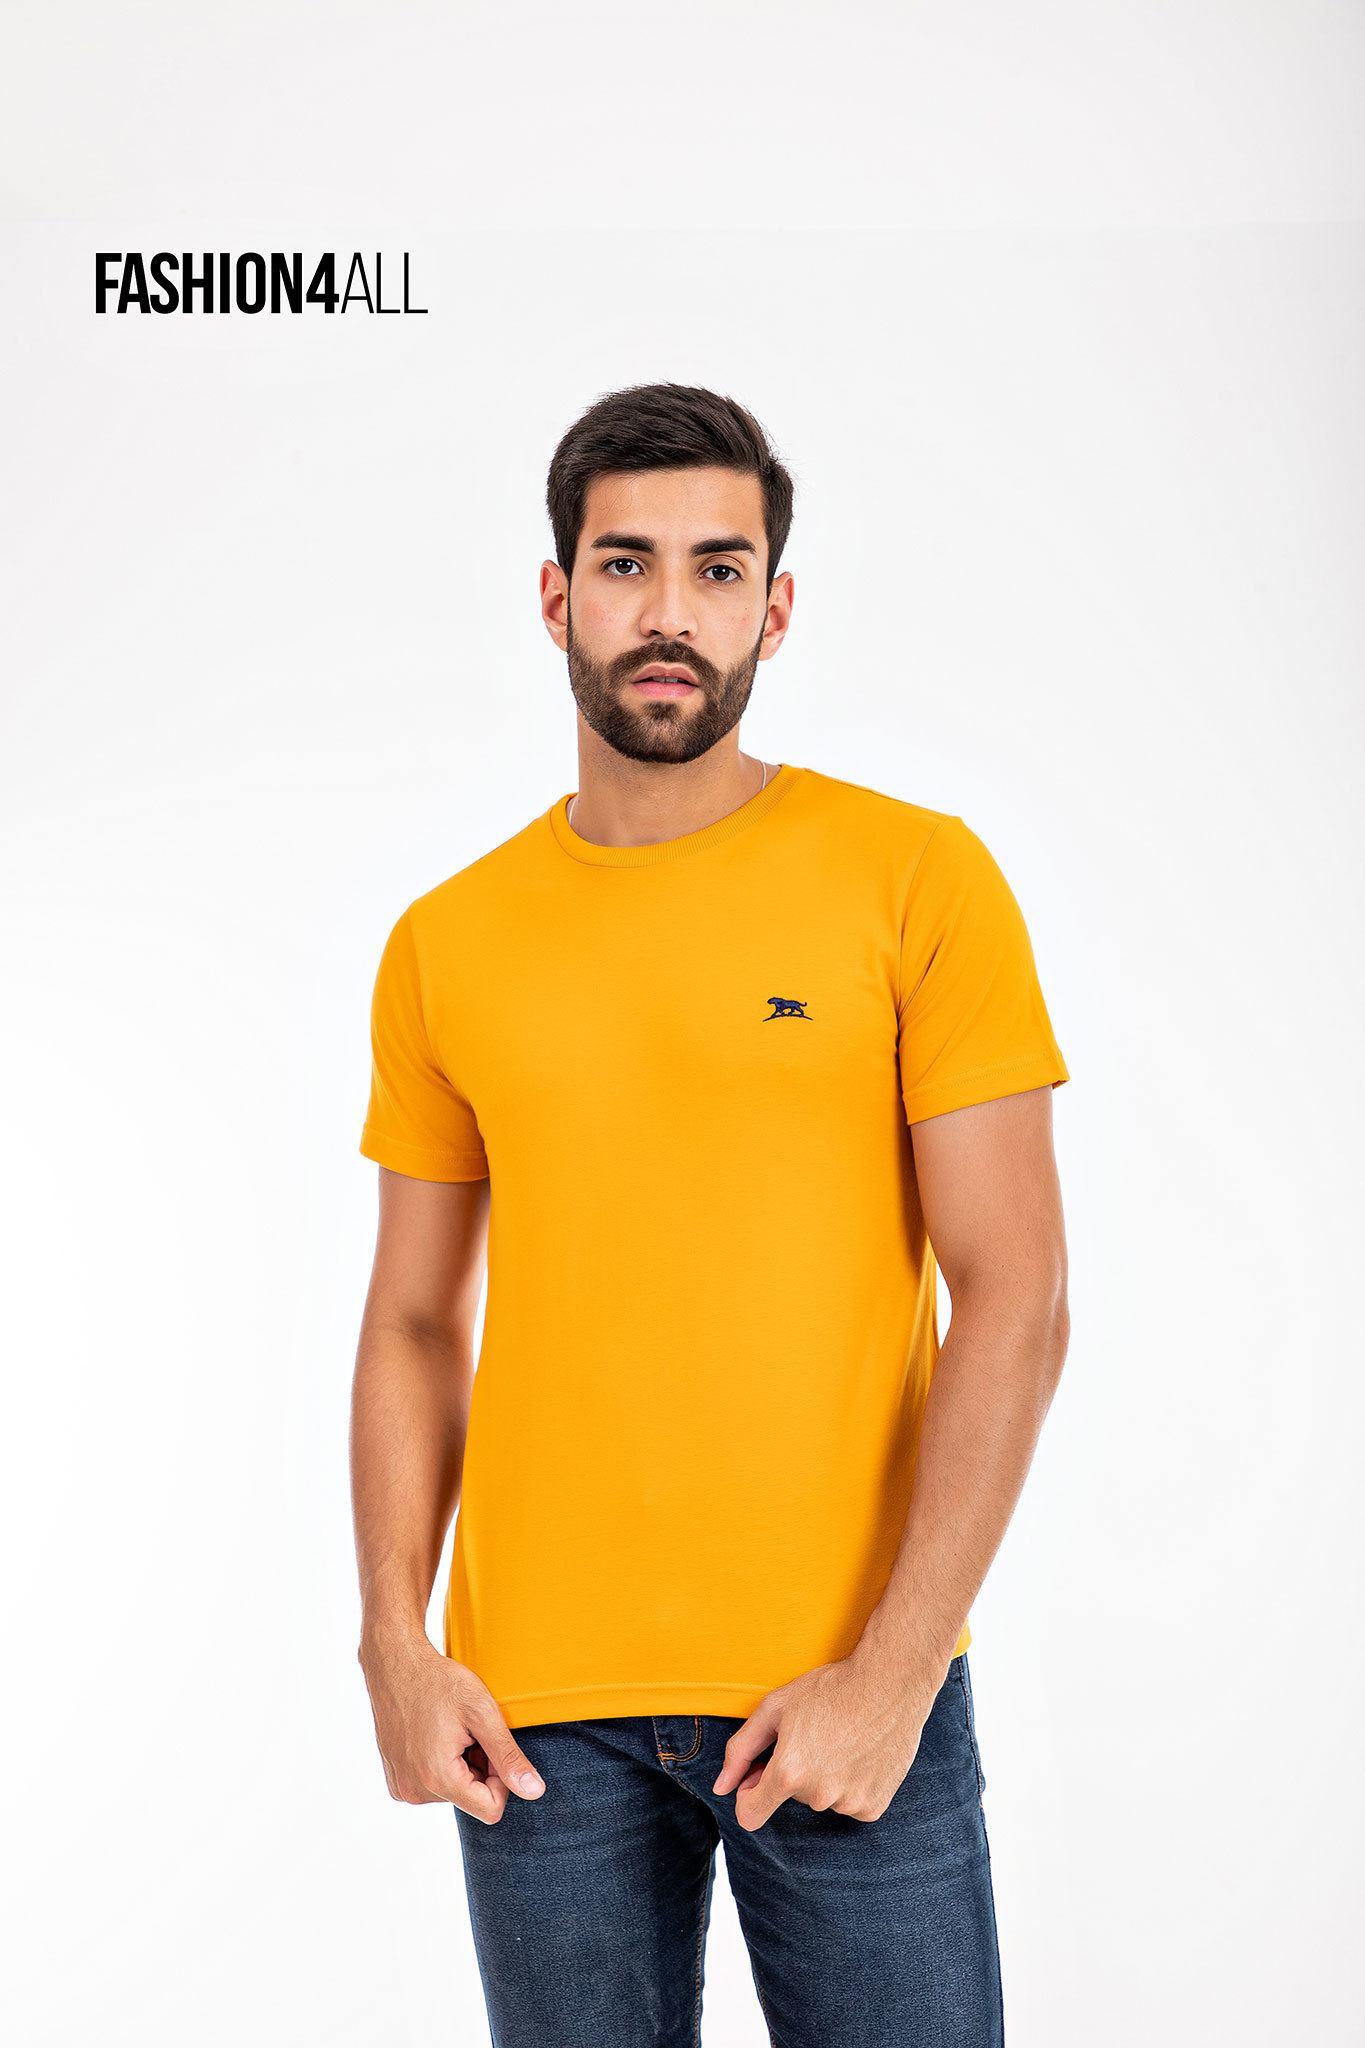 Camisa gola careca masculina TIGRE MALHADO